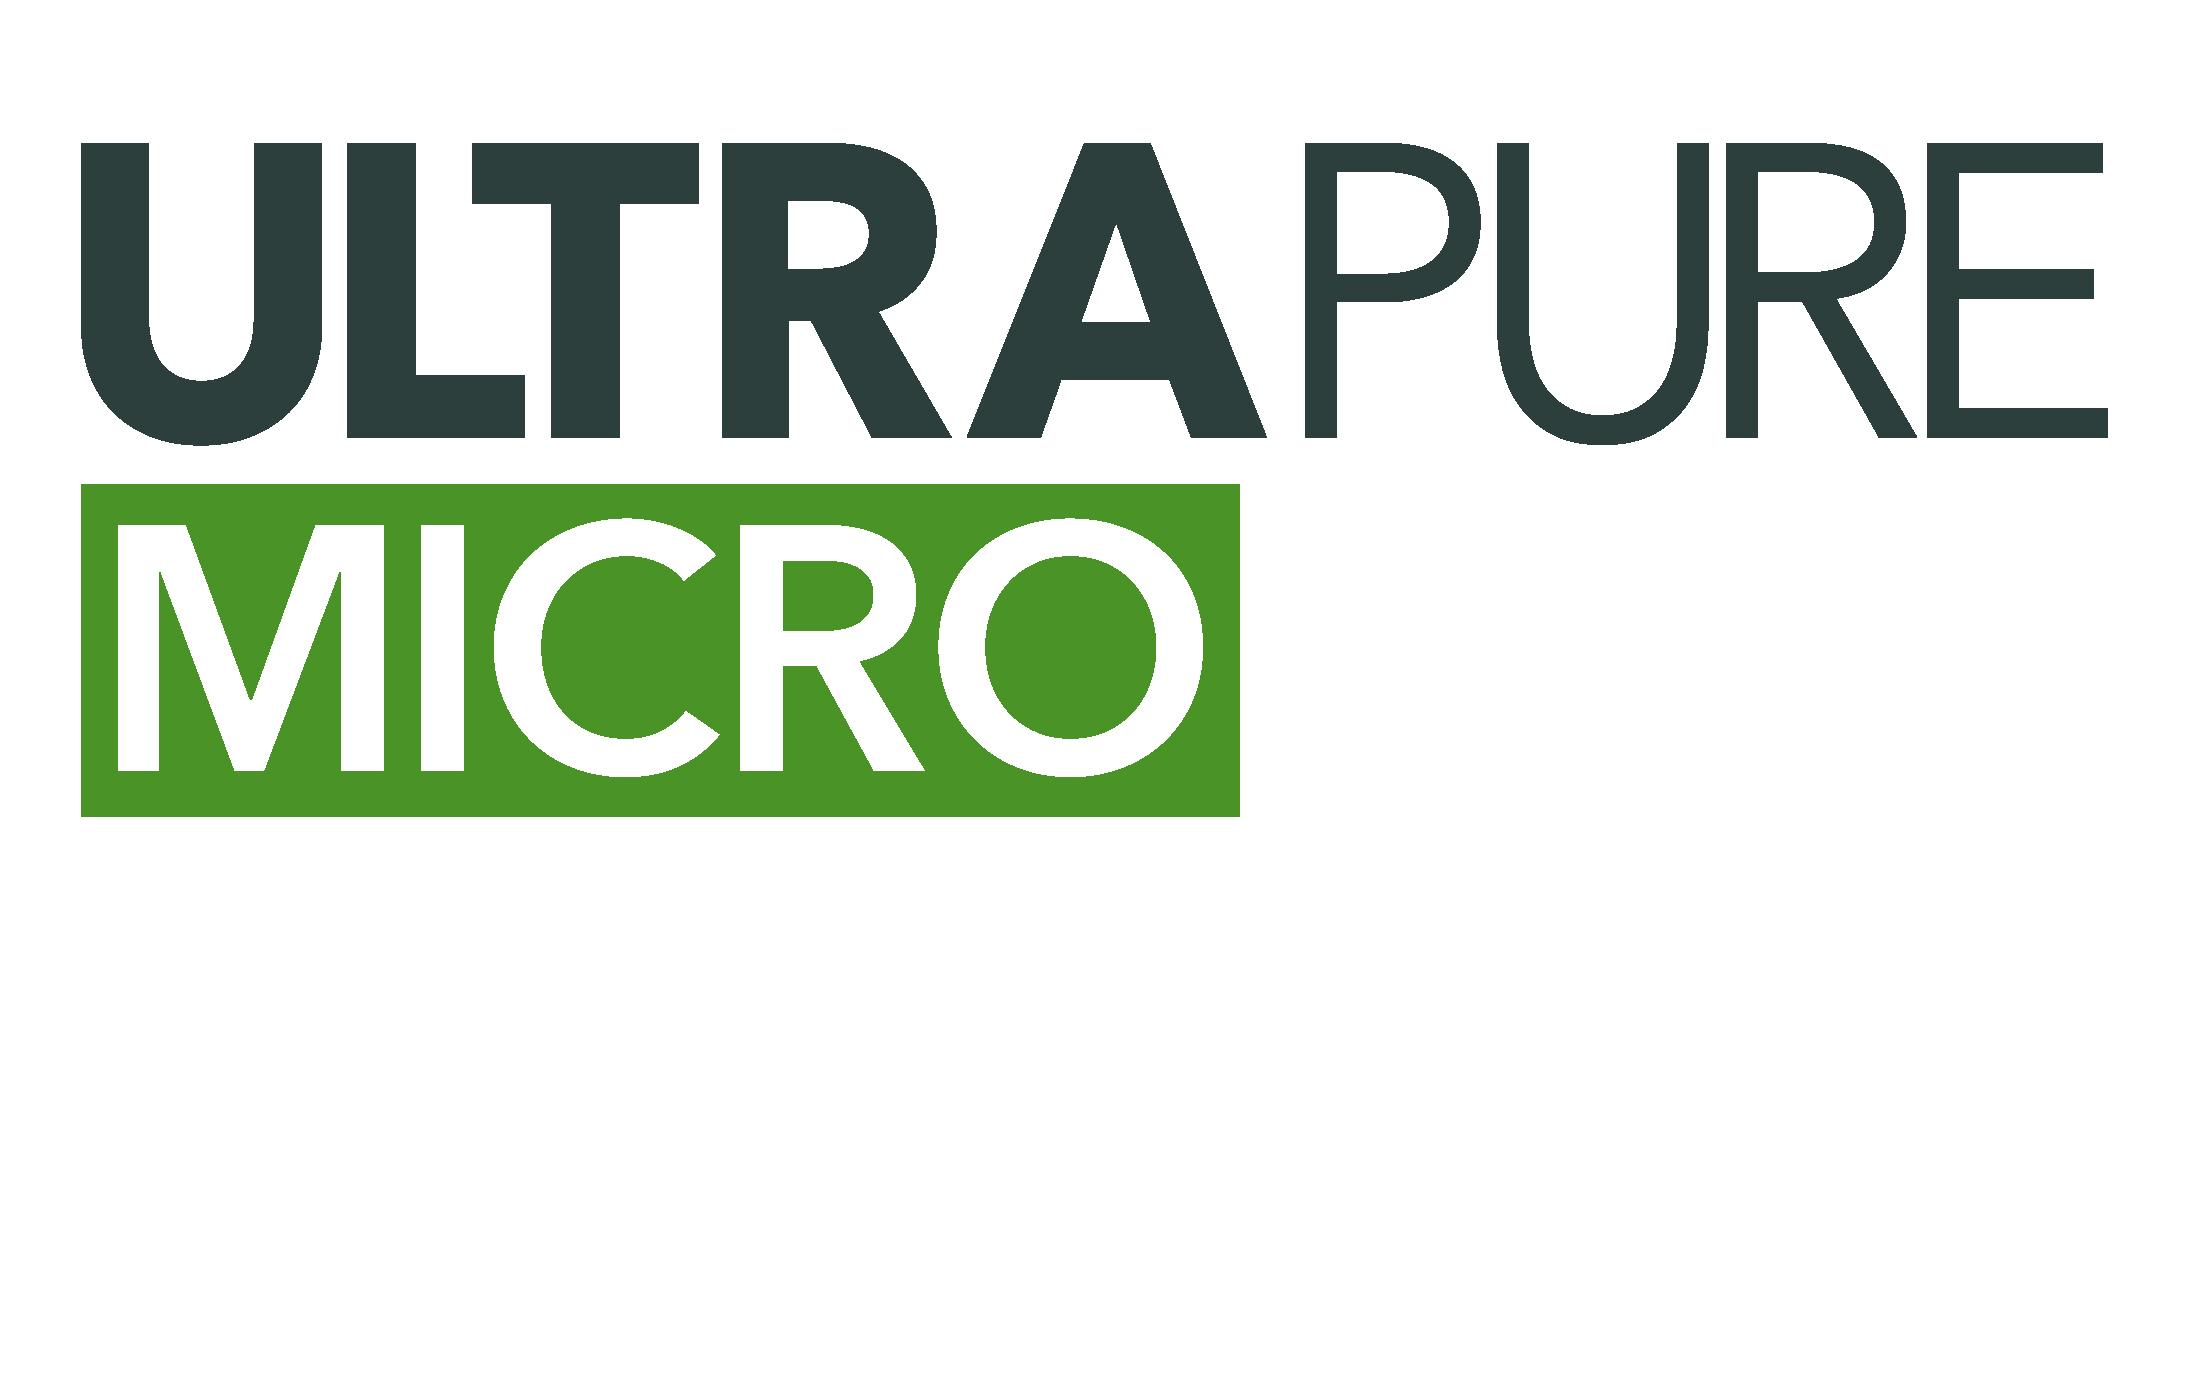 upw logo-01.jpg